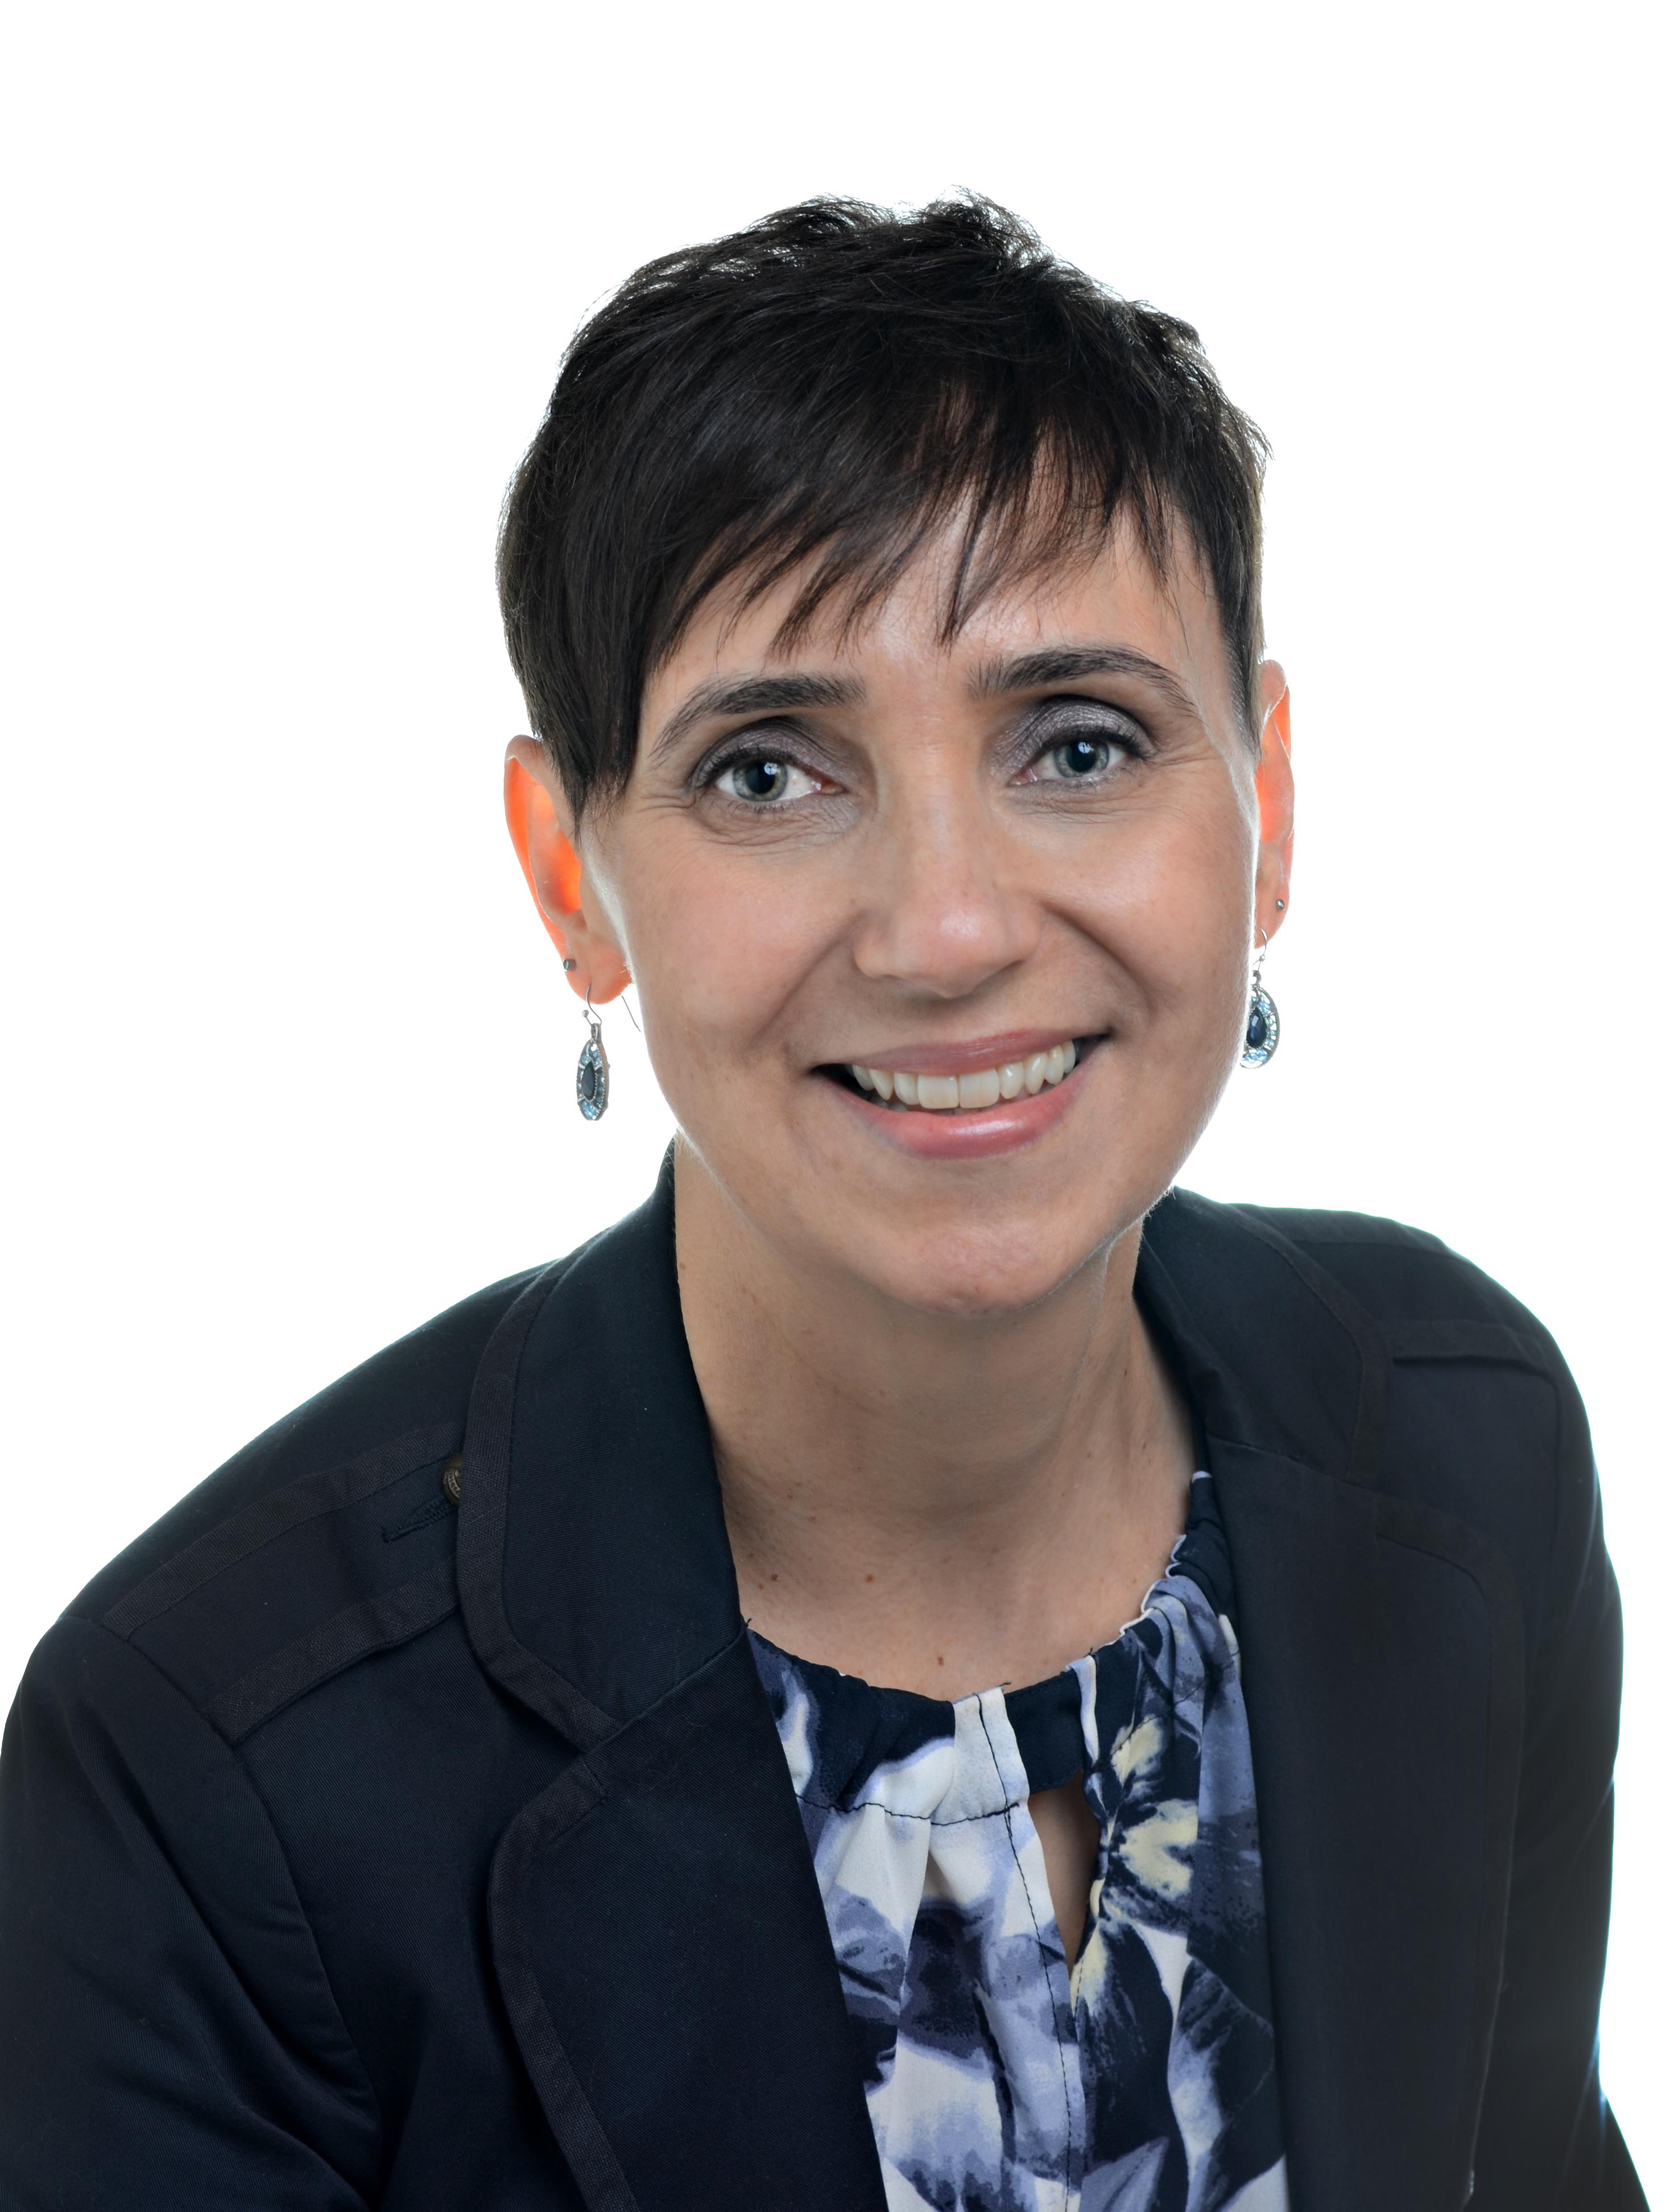 Megan Dumais